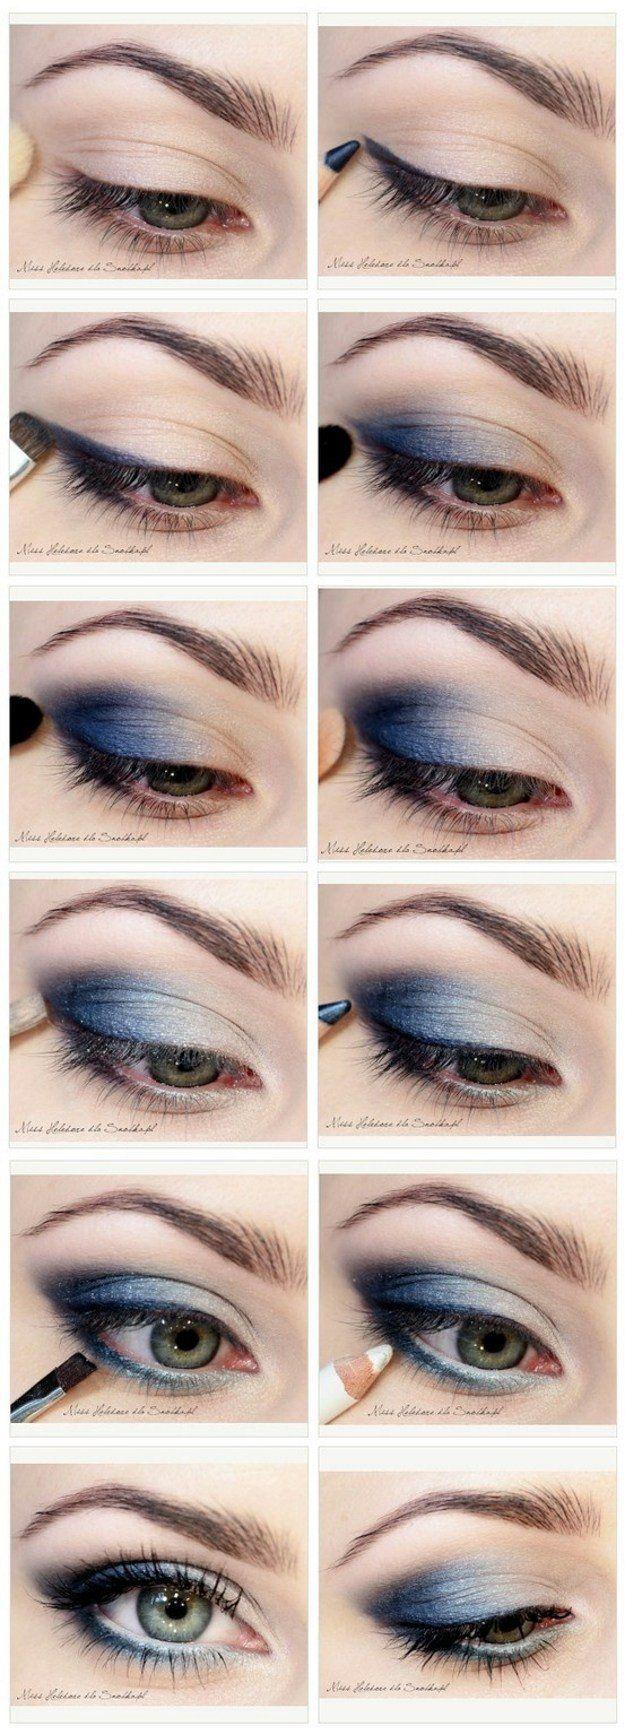 How to Do Blue Smokey Eyes | Graduation Makeup Tutorials by www.makeuptutoria......